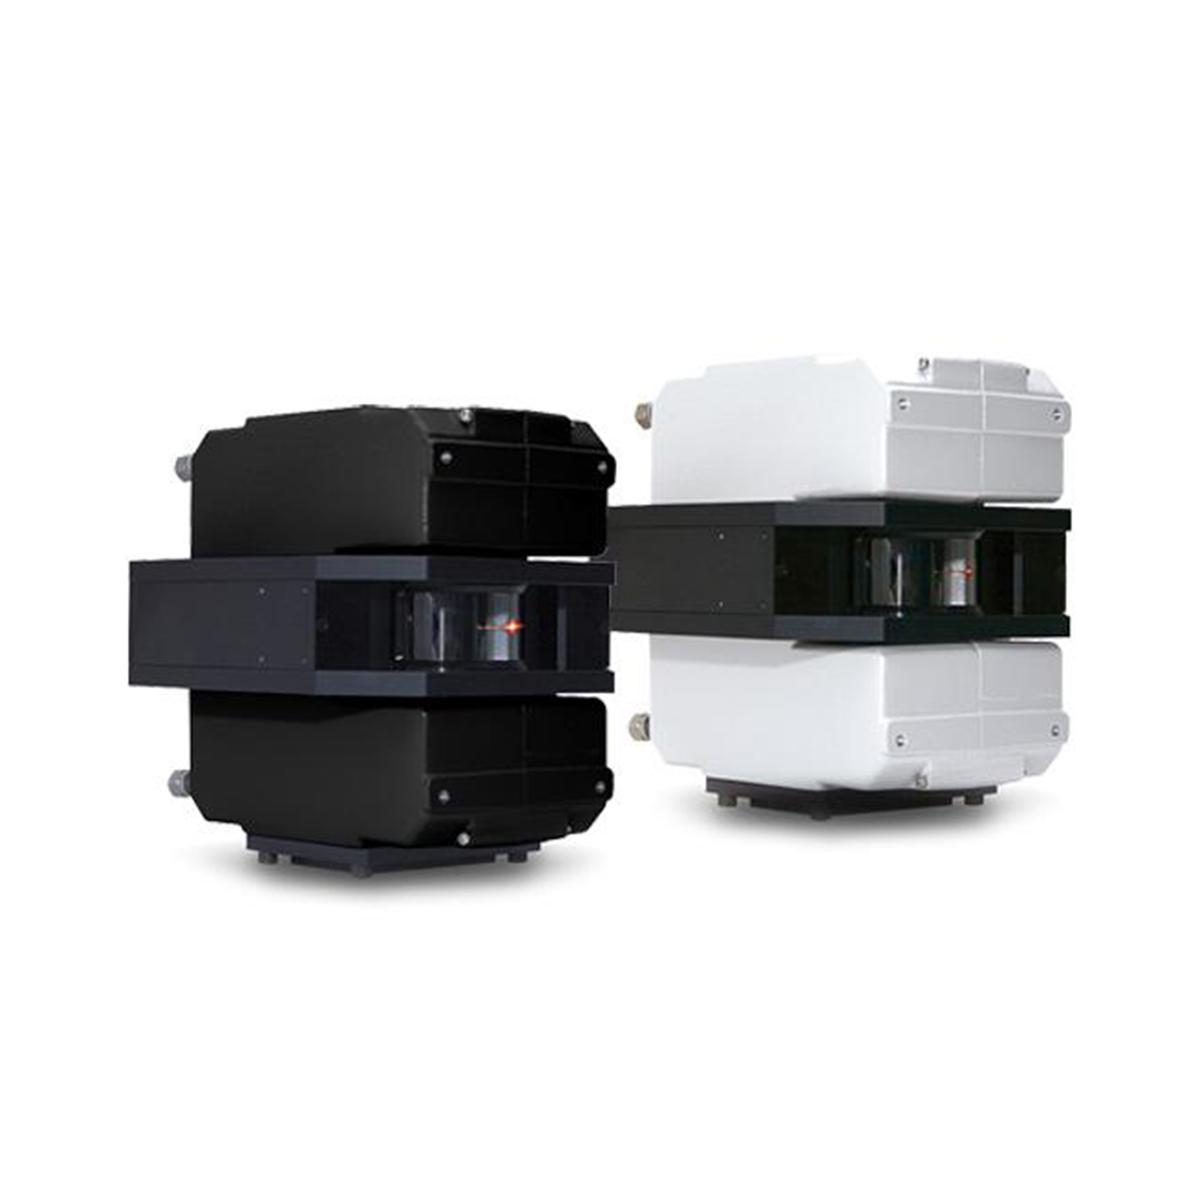 FLU-pi_Linescanners_BHD